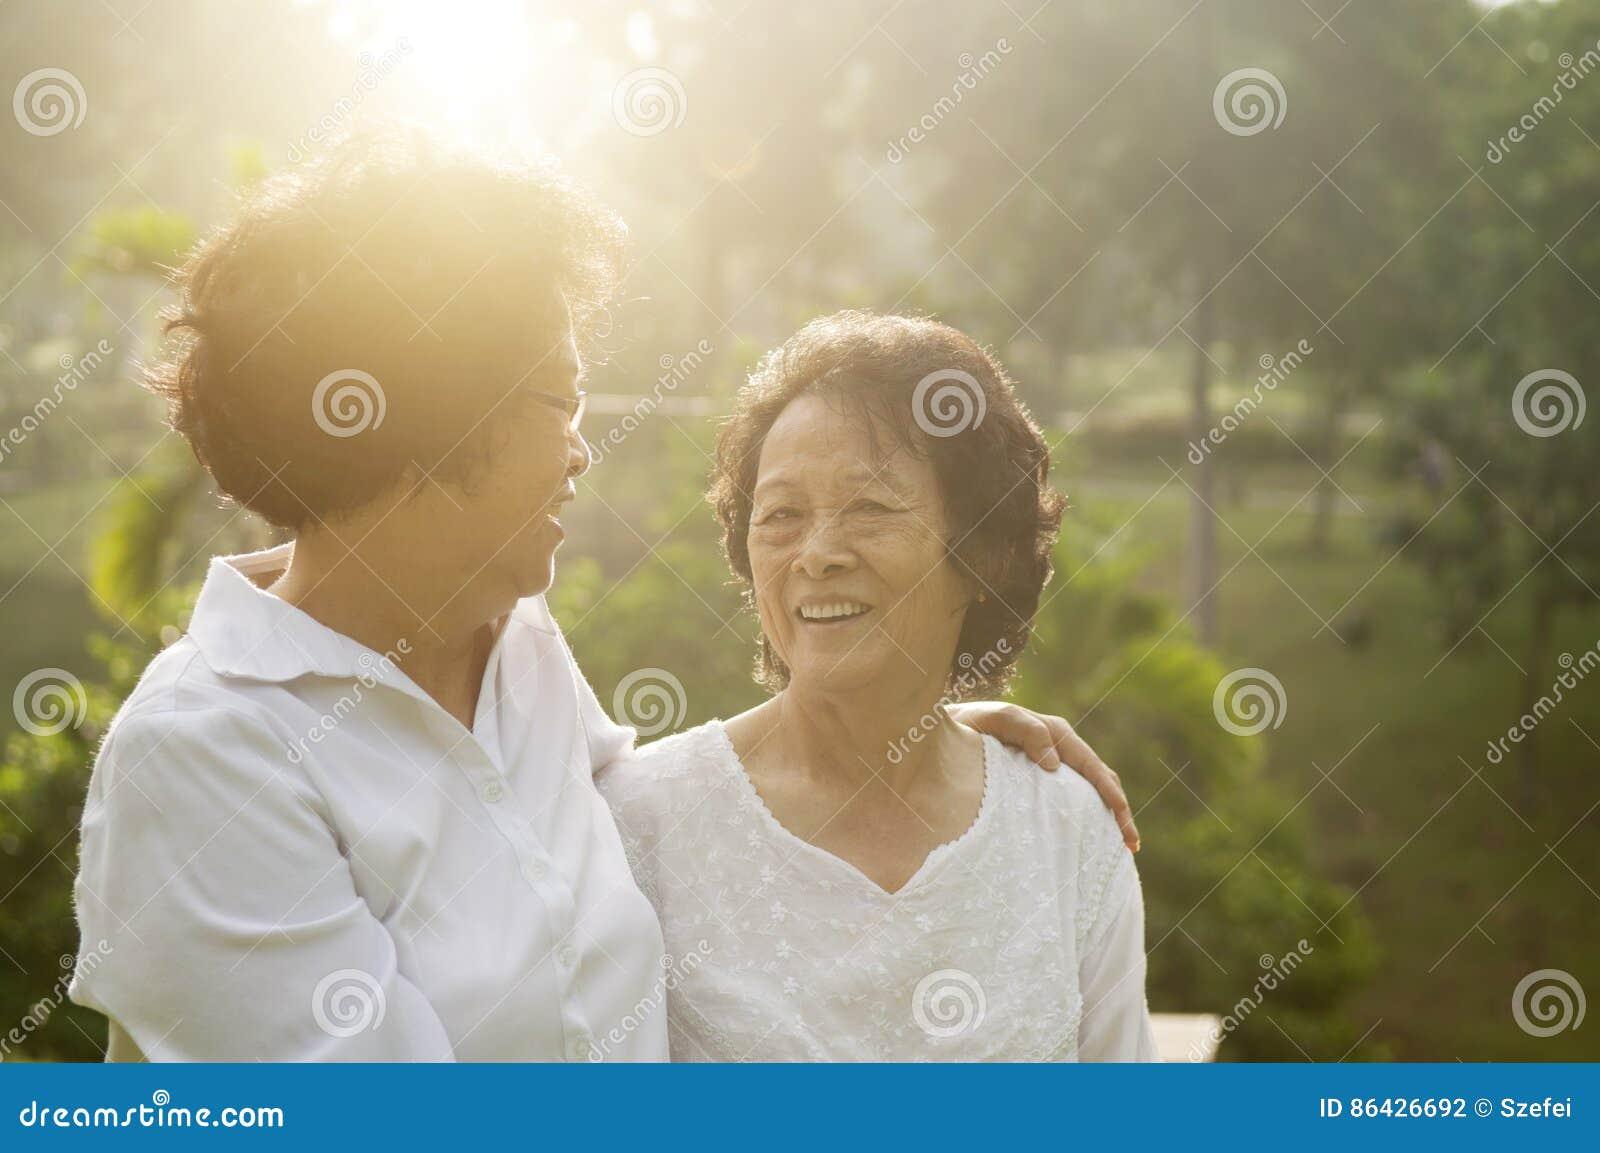 Asian seniors family at outdoor